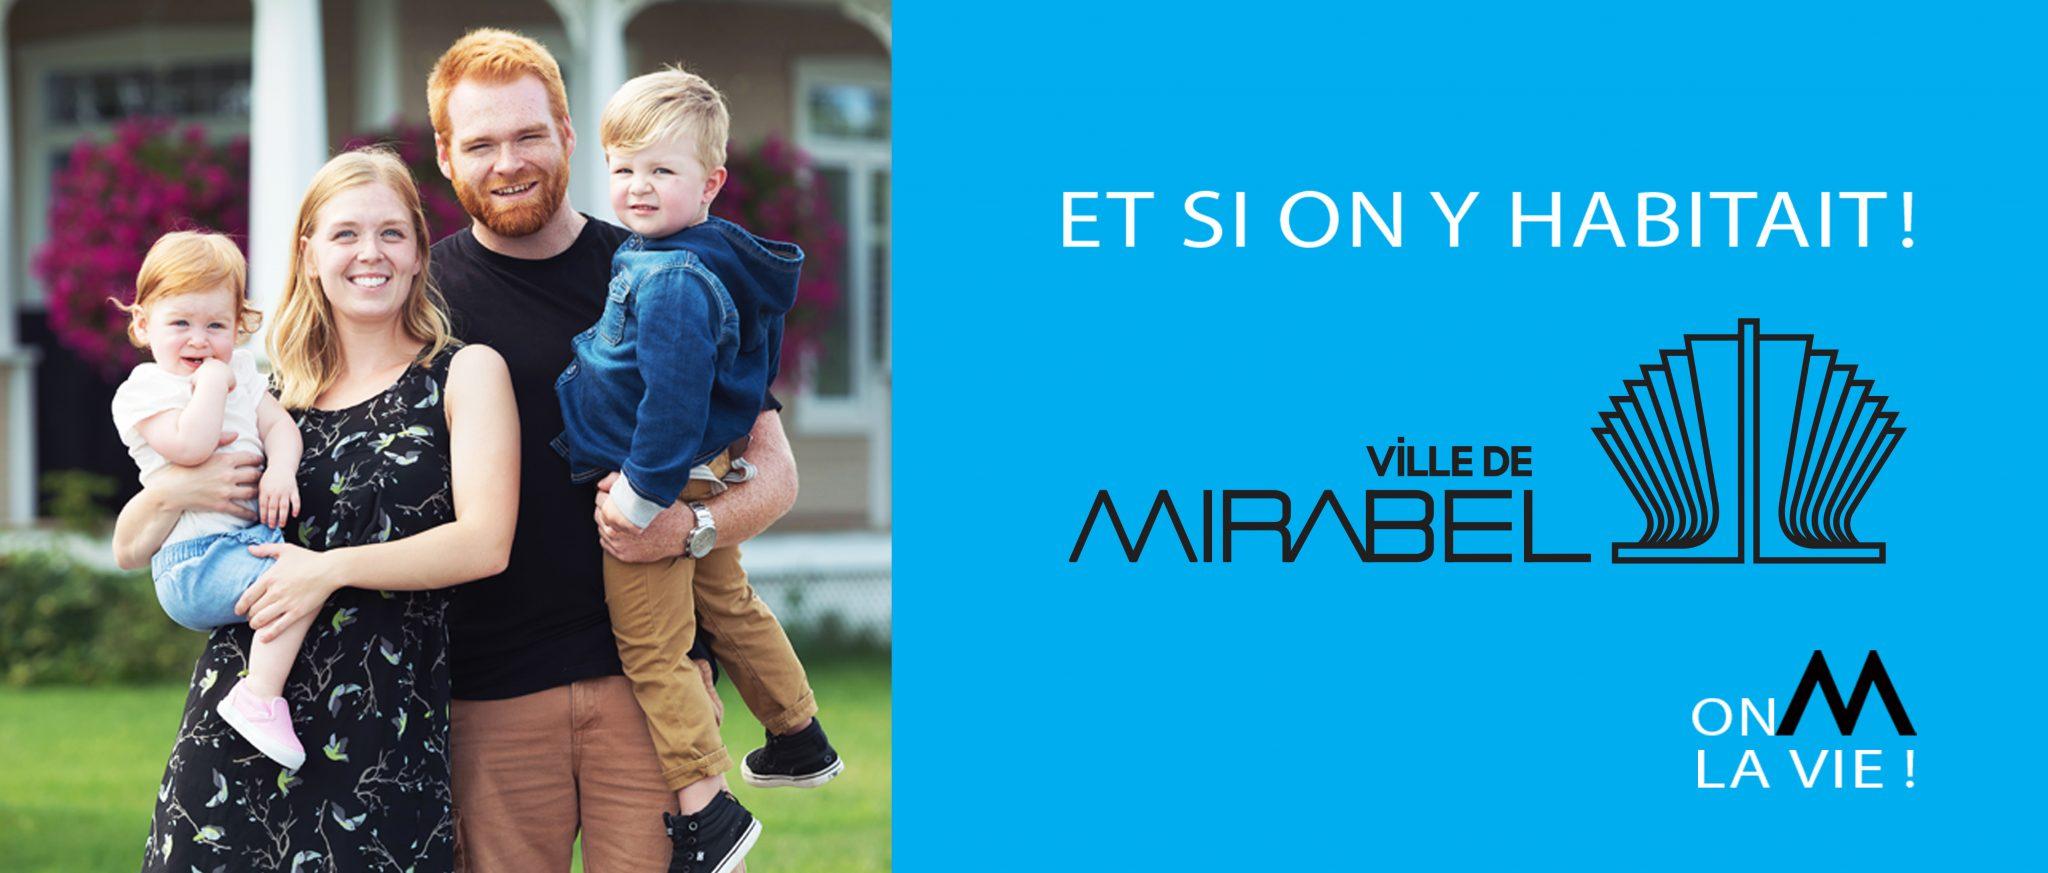 Ville de Mirabel - Slogan - Constructions neuves a Mirabel